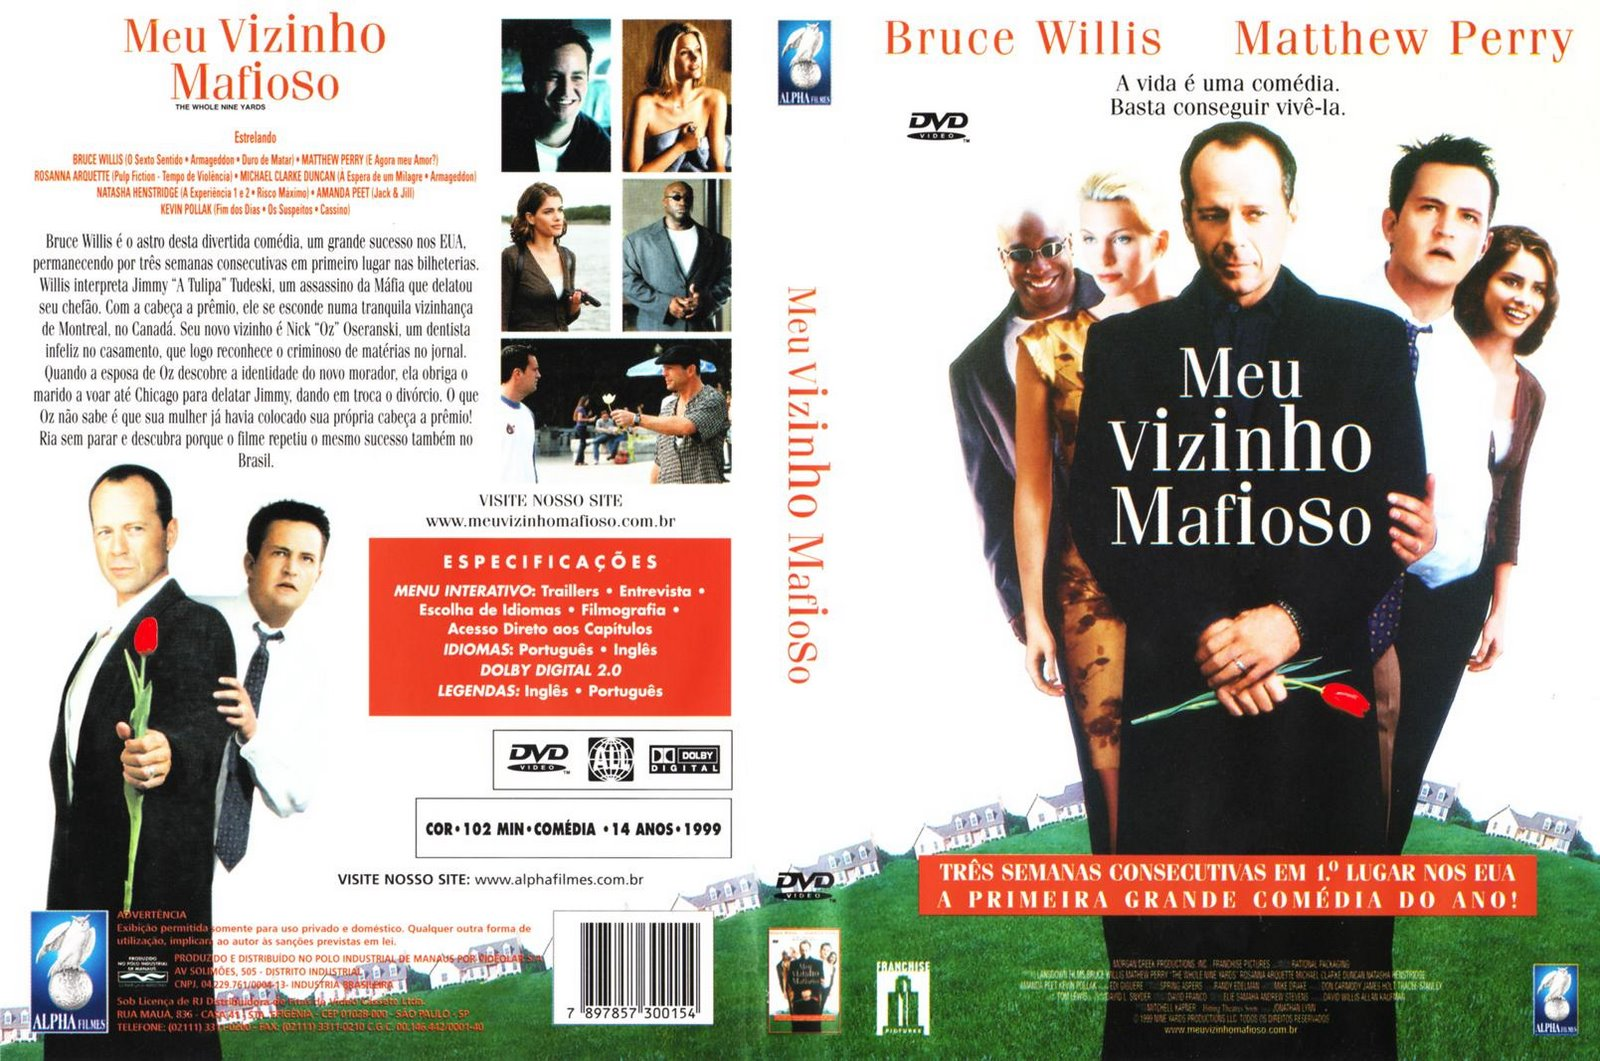 http://2.bp.blogspot.com/_ET4mSvvgIvQ/S83Yyvc4PzI/AAAAAAAAAEc/eXvtEYSUqZ8/s1600/Meu_Vizinho_Mafioso_-_capa_02.jpg